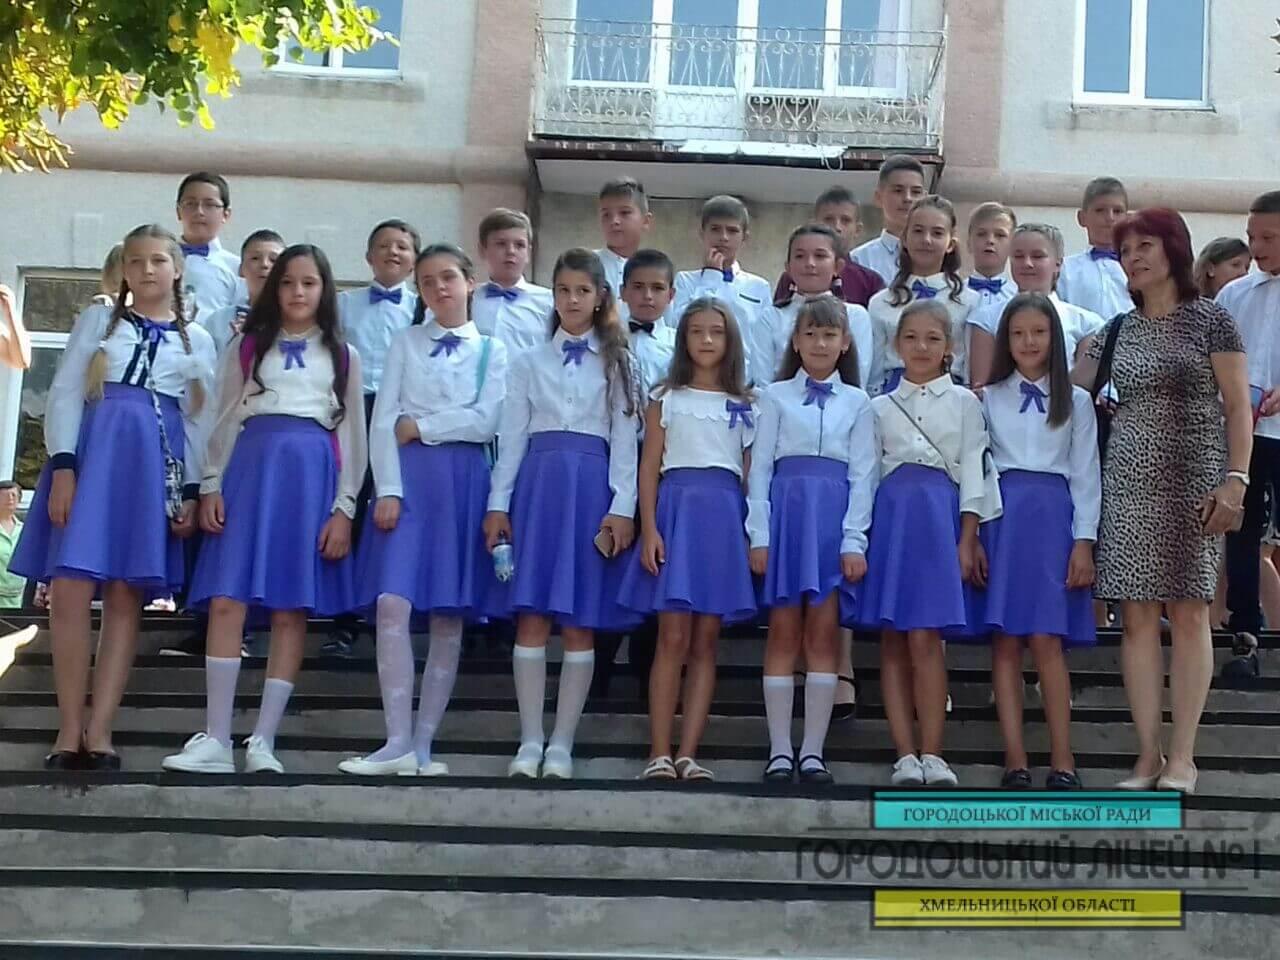 zobrazhennya viber 2019 09 02 22 22 10 - Україна - європейська країна